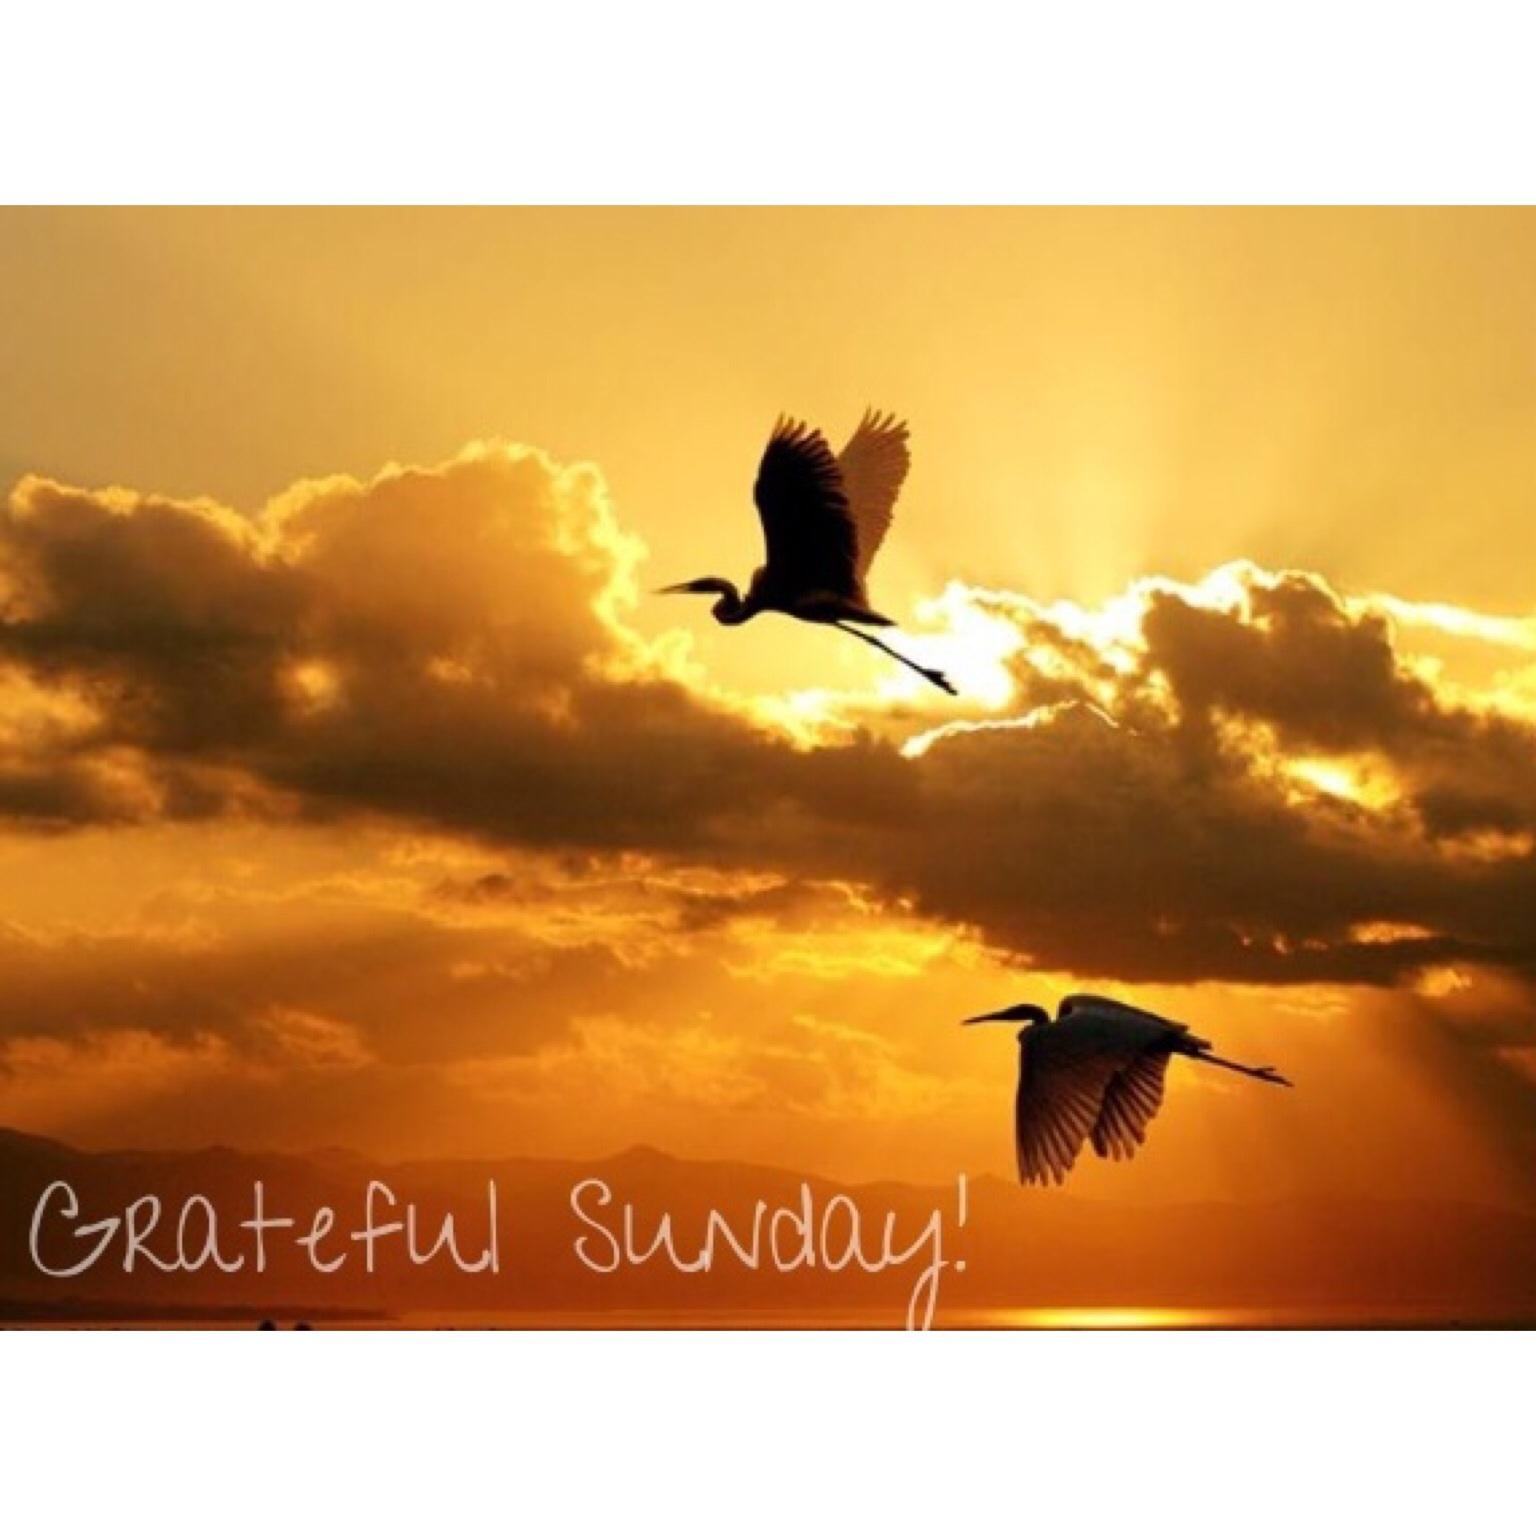 I am grateful for the birds!